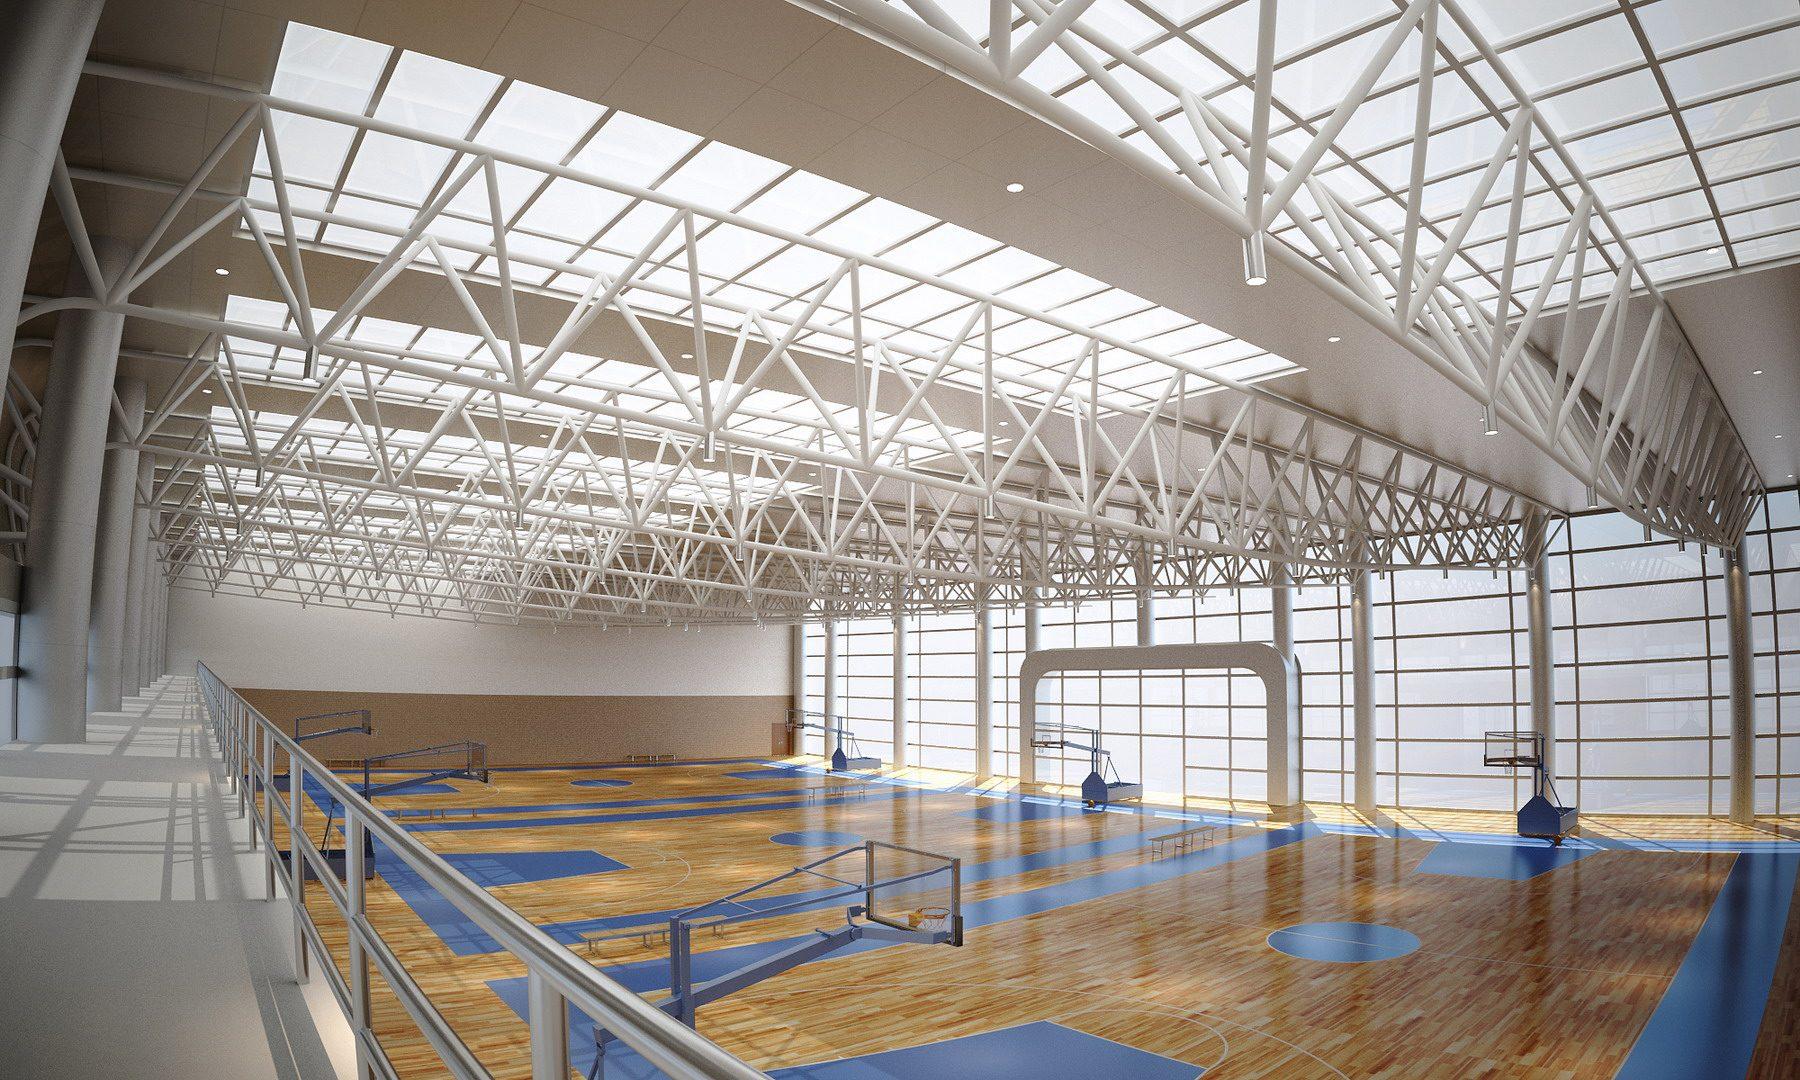 basketball gymnasium arena 3d model 3ds max 138830